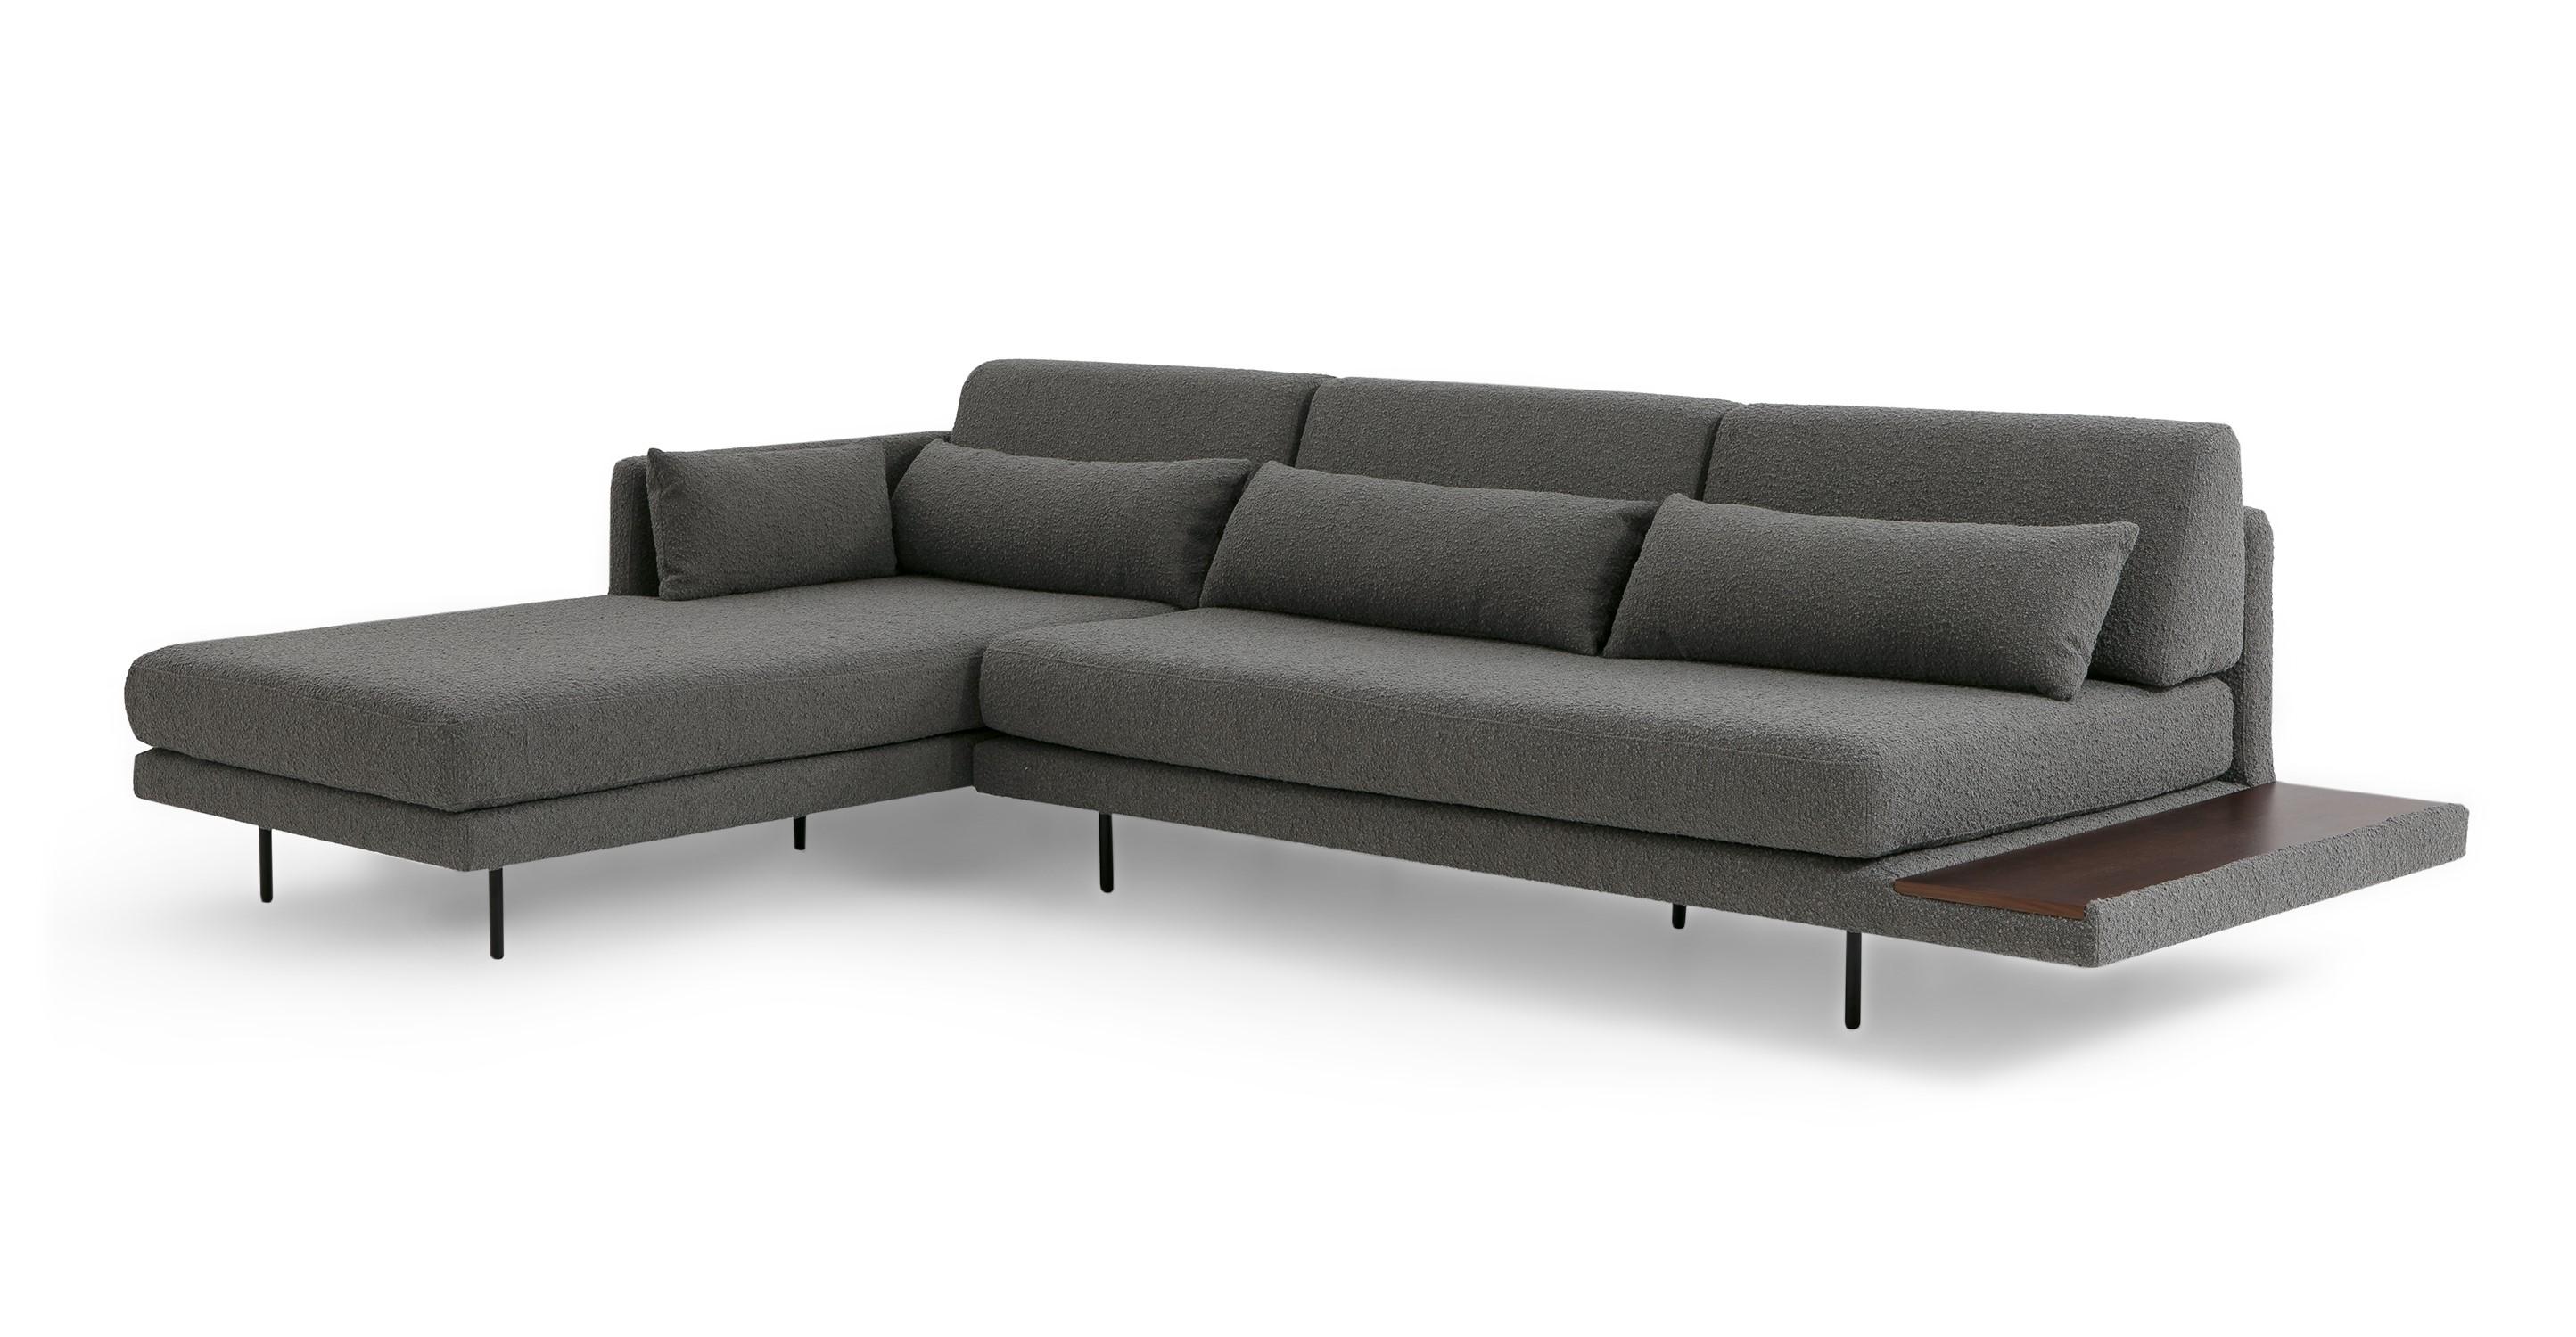 "Davenport 116"" Fabric Sofa Sectional Left, Gris Boucle"